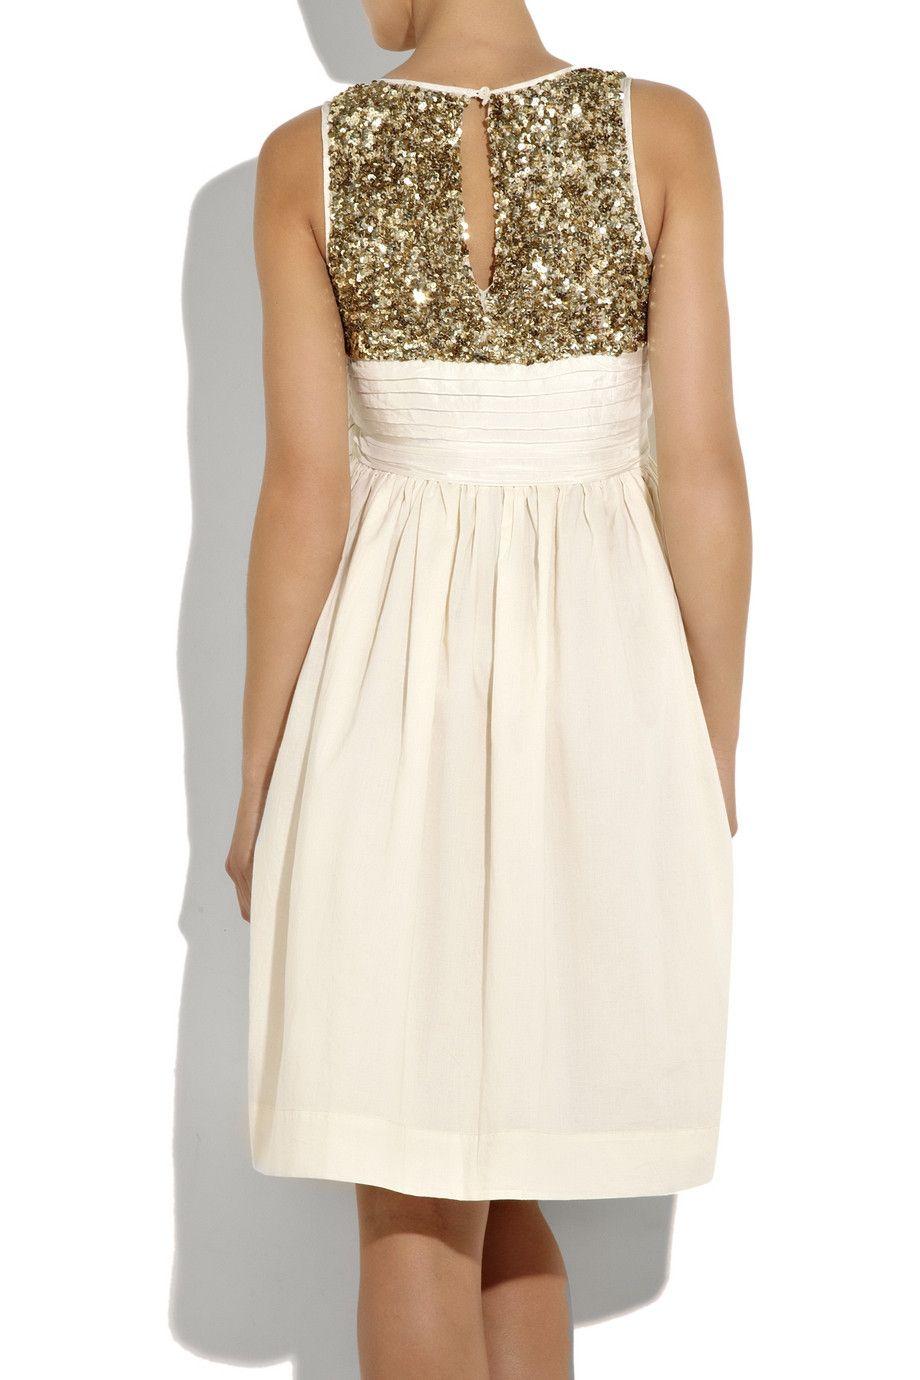 DAY Birger et Mikkelsen - Sequin and cotton sleeveless dress $280 #sparkly #sequin #dress